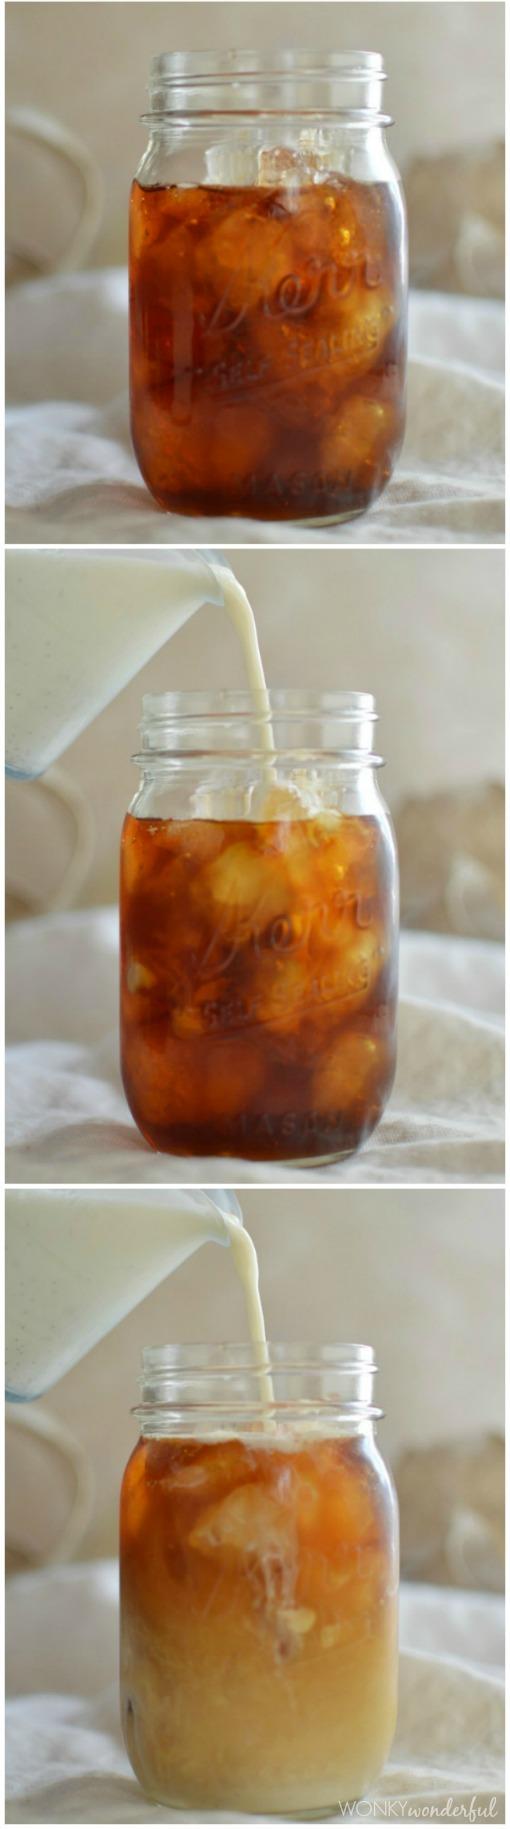 Cold Brewed Iced Coffee with Vanilla Cardamom Homemade Coffee Creamer - wonkywonderful.com